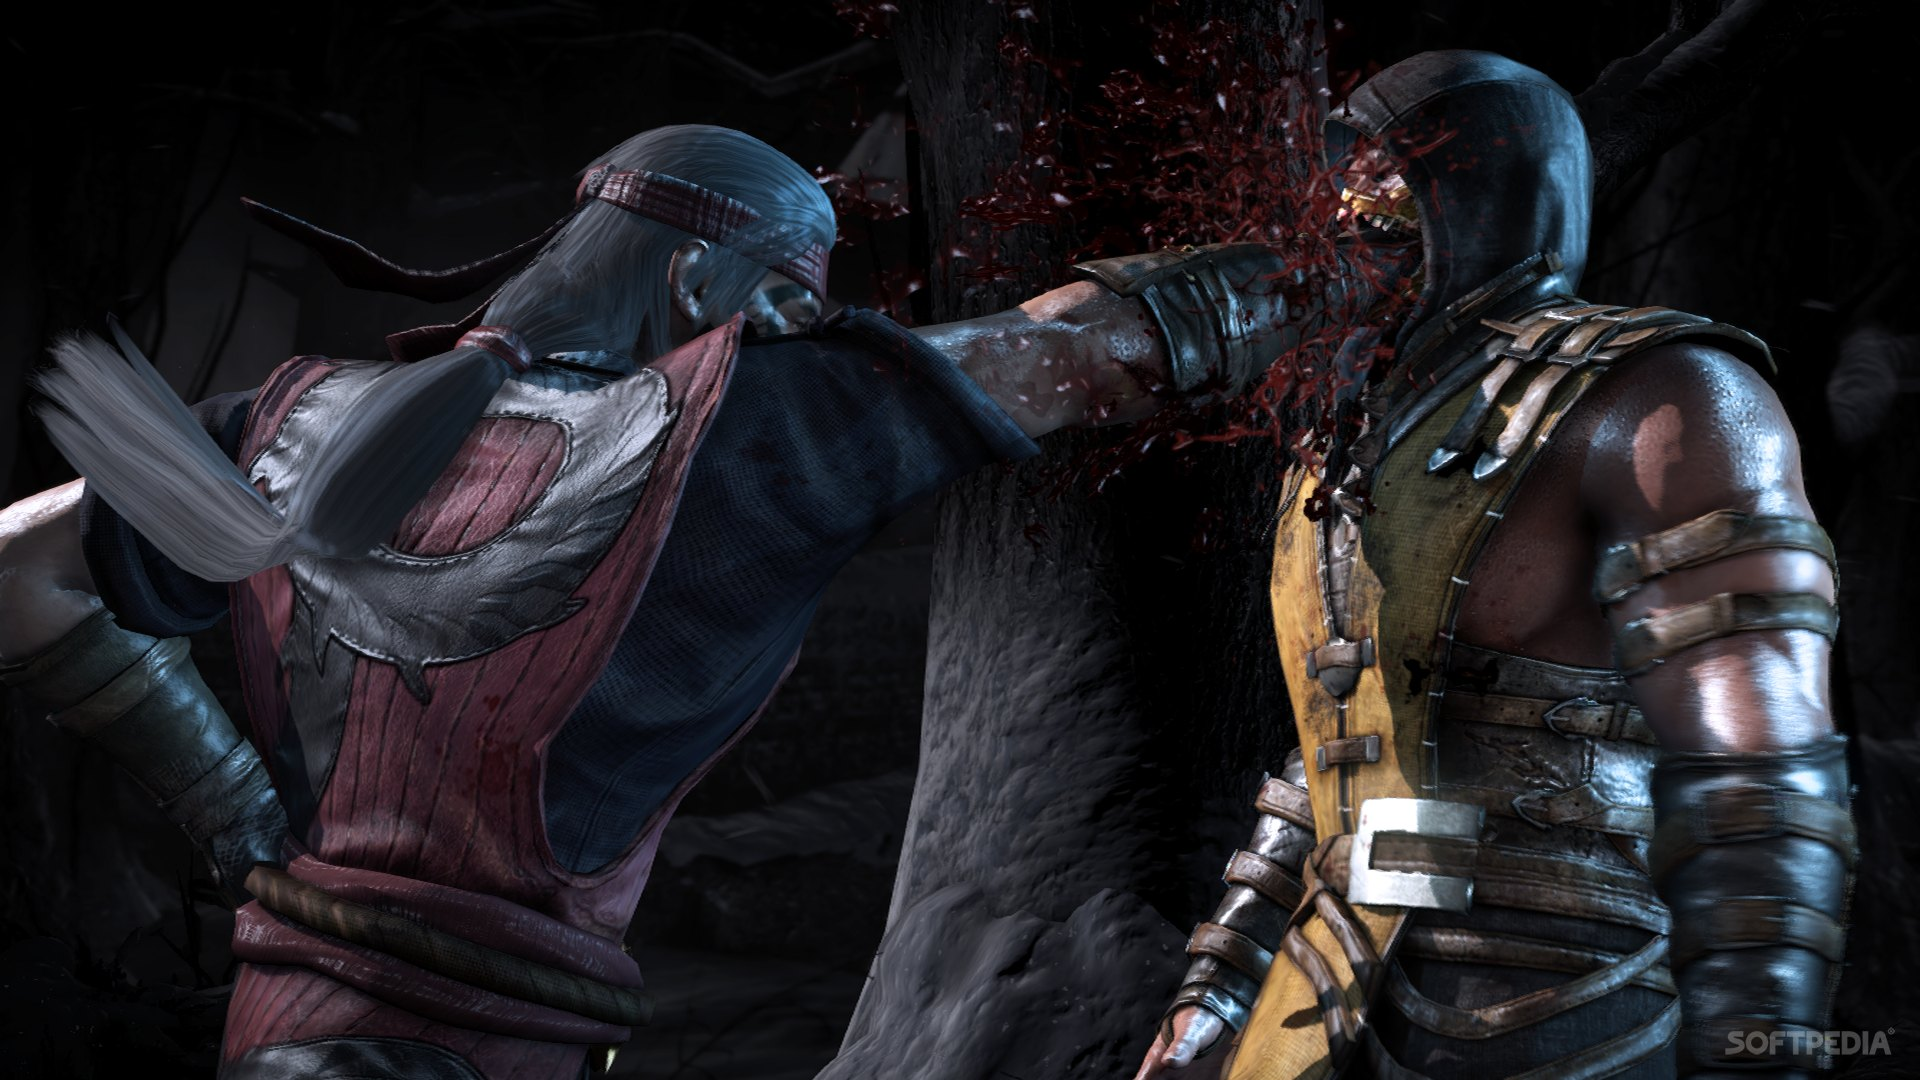 Mortal Kombat X Nails the Balance Between Innovation and Old